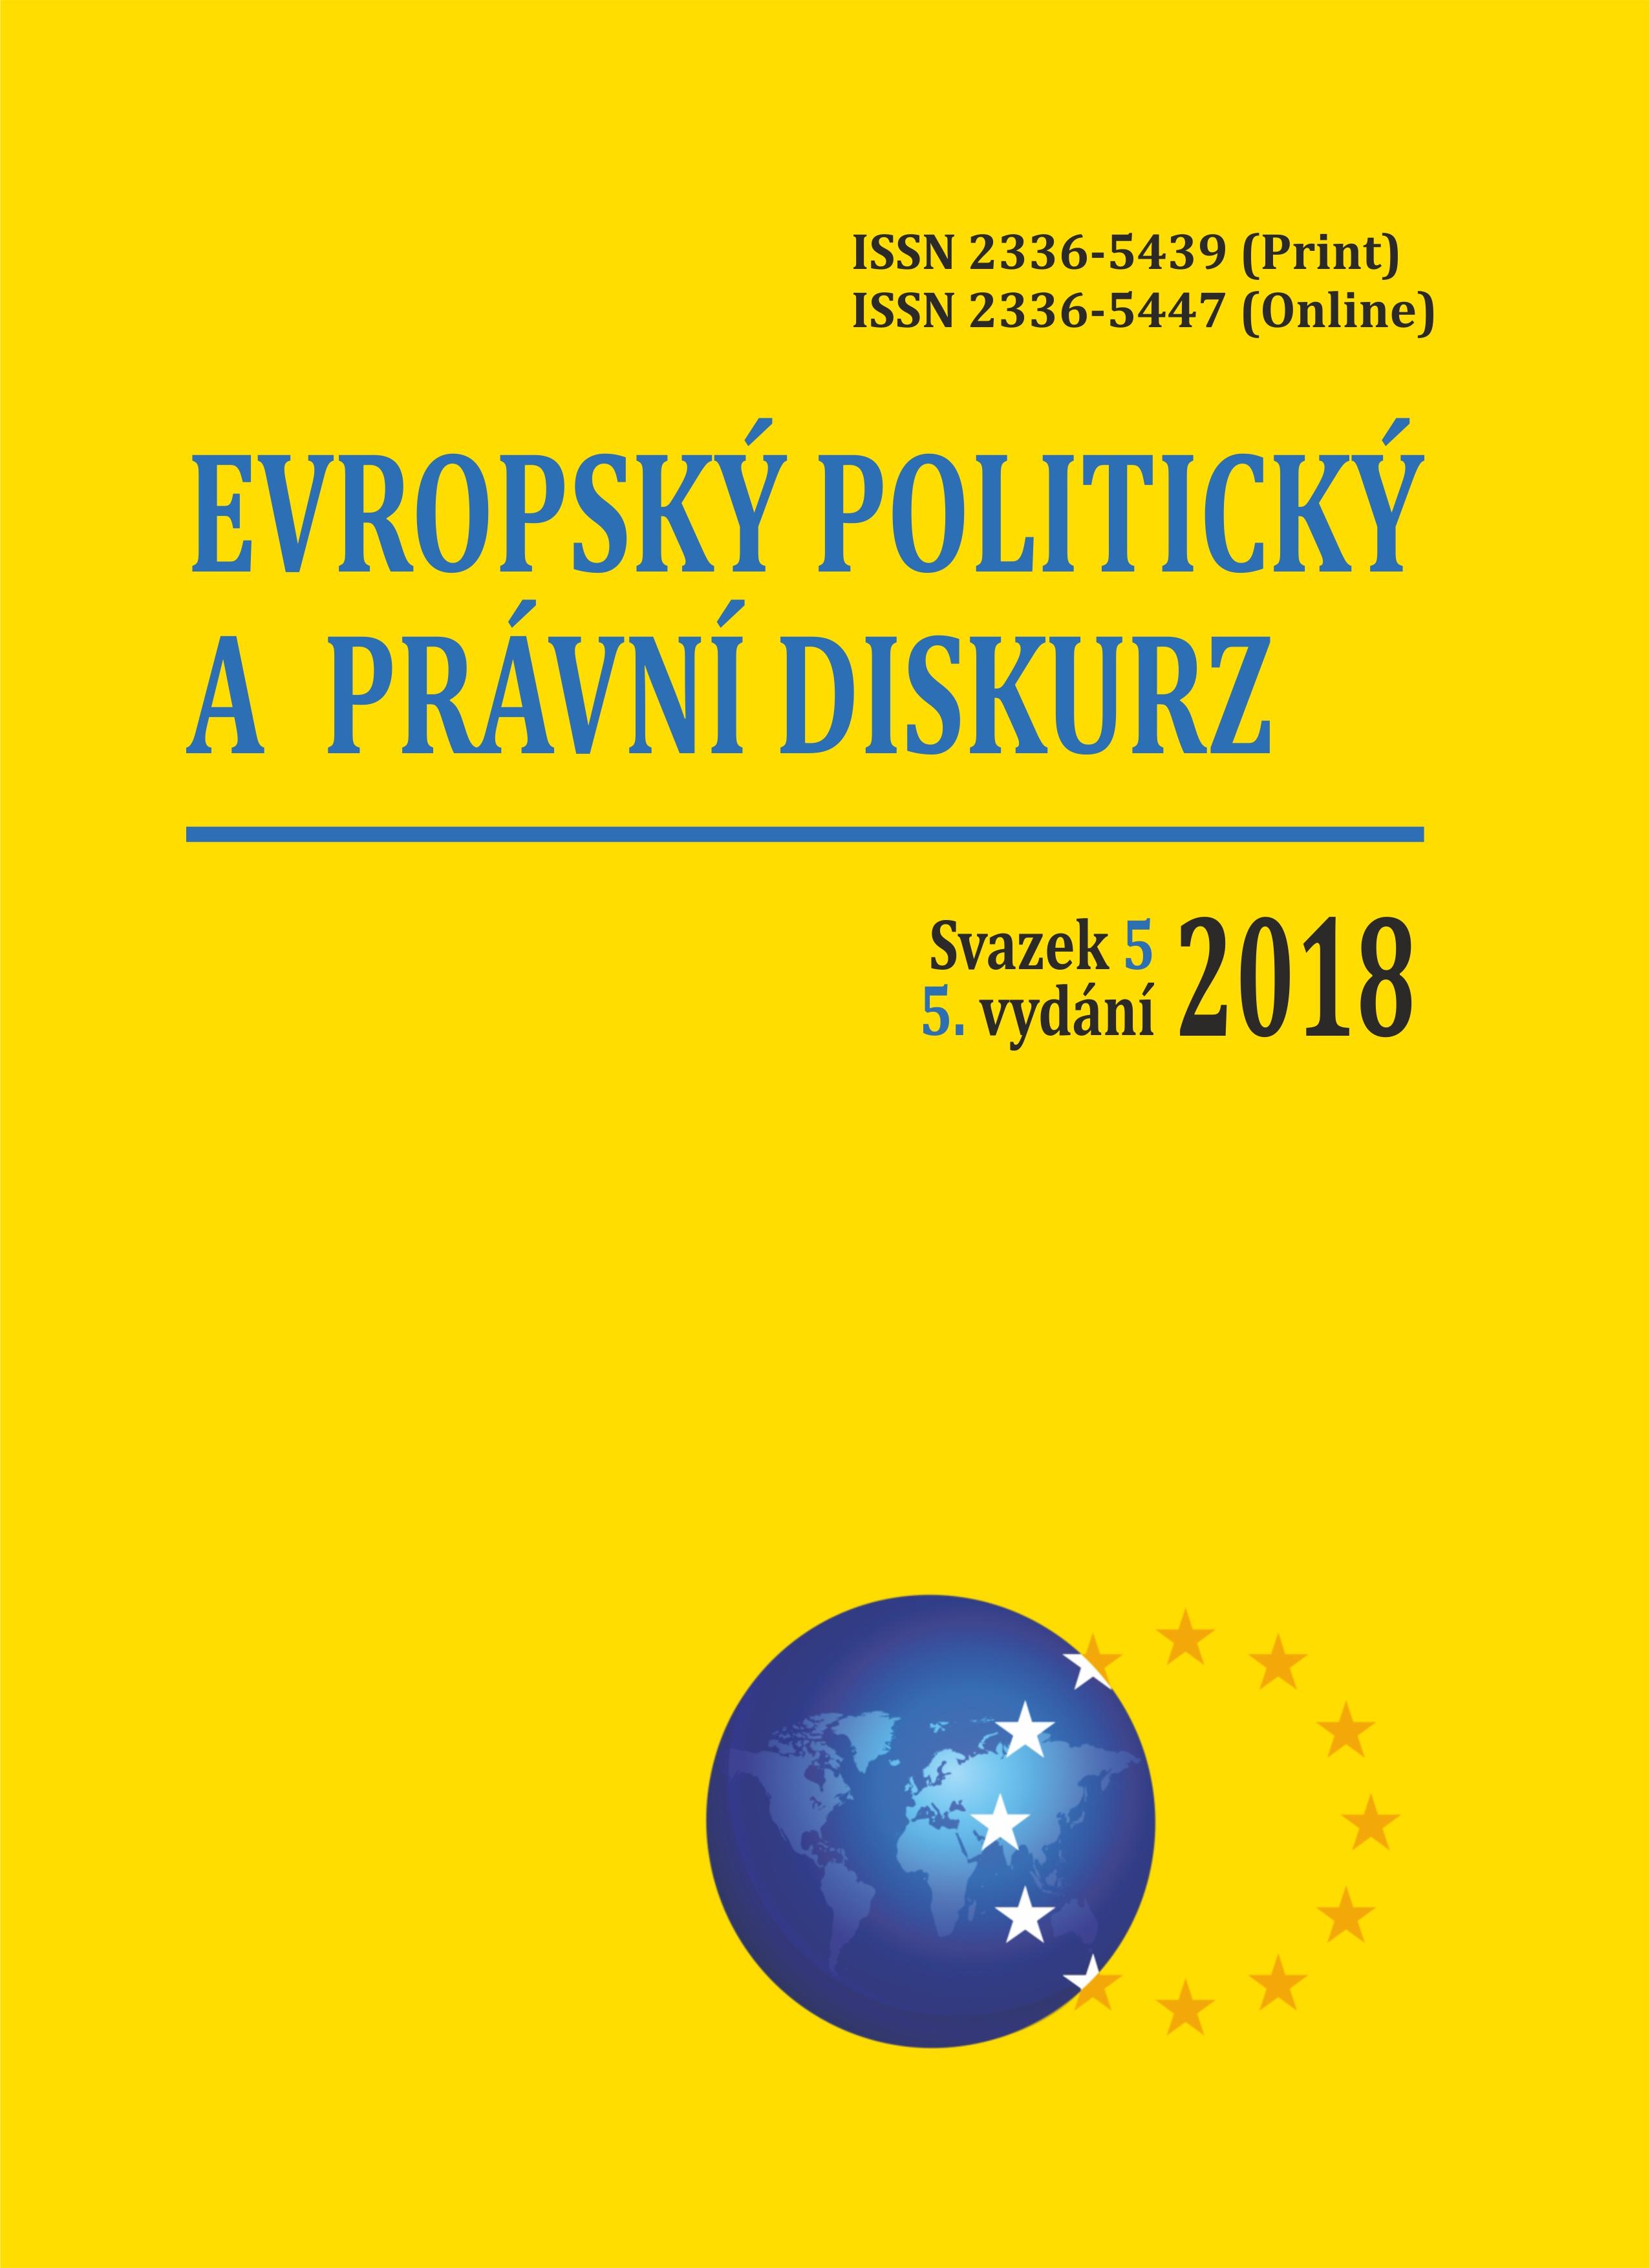 EPPD_Obl_2018